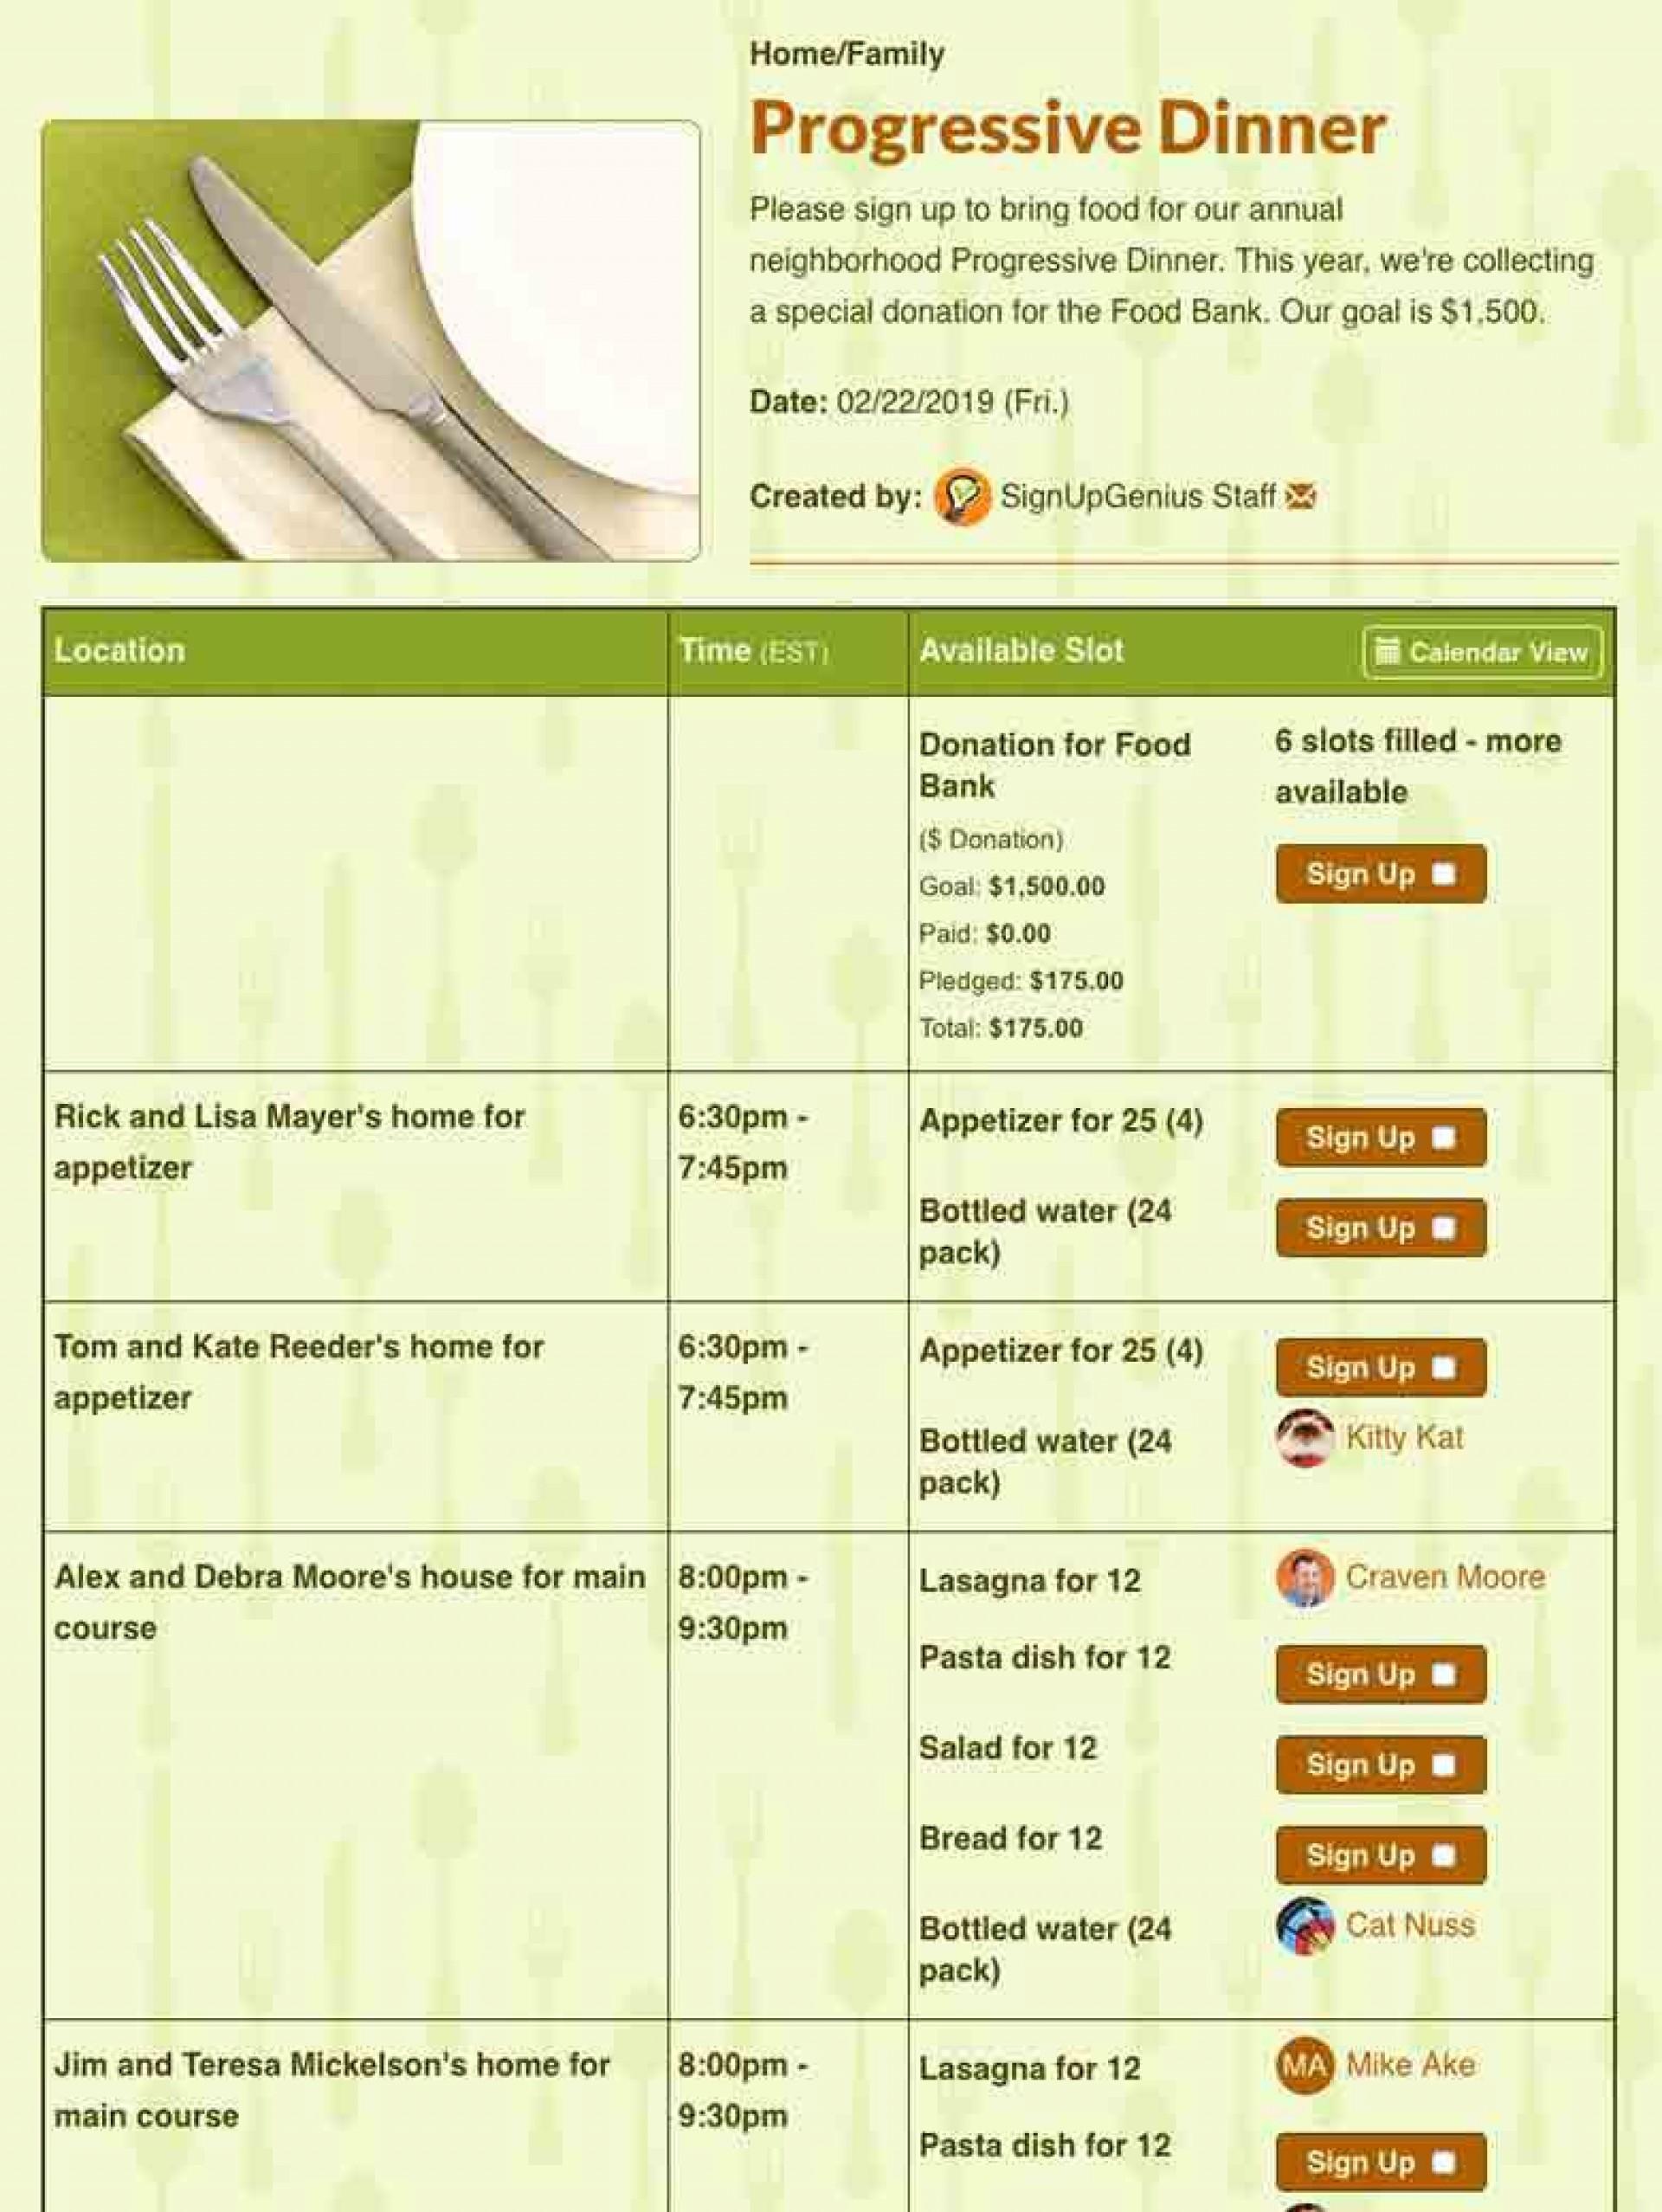 001 Rare Meal Sign Up Sheet Template High Def  Christma Potluck Free Printable Blank1920